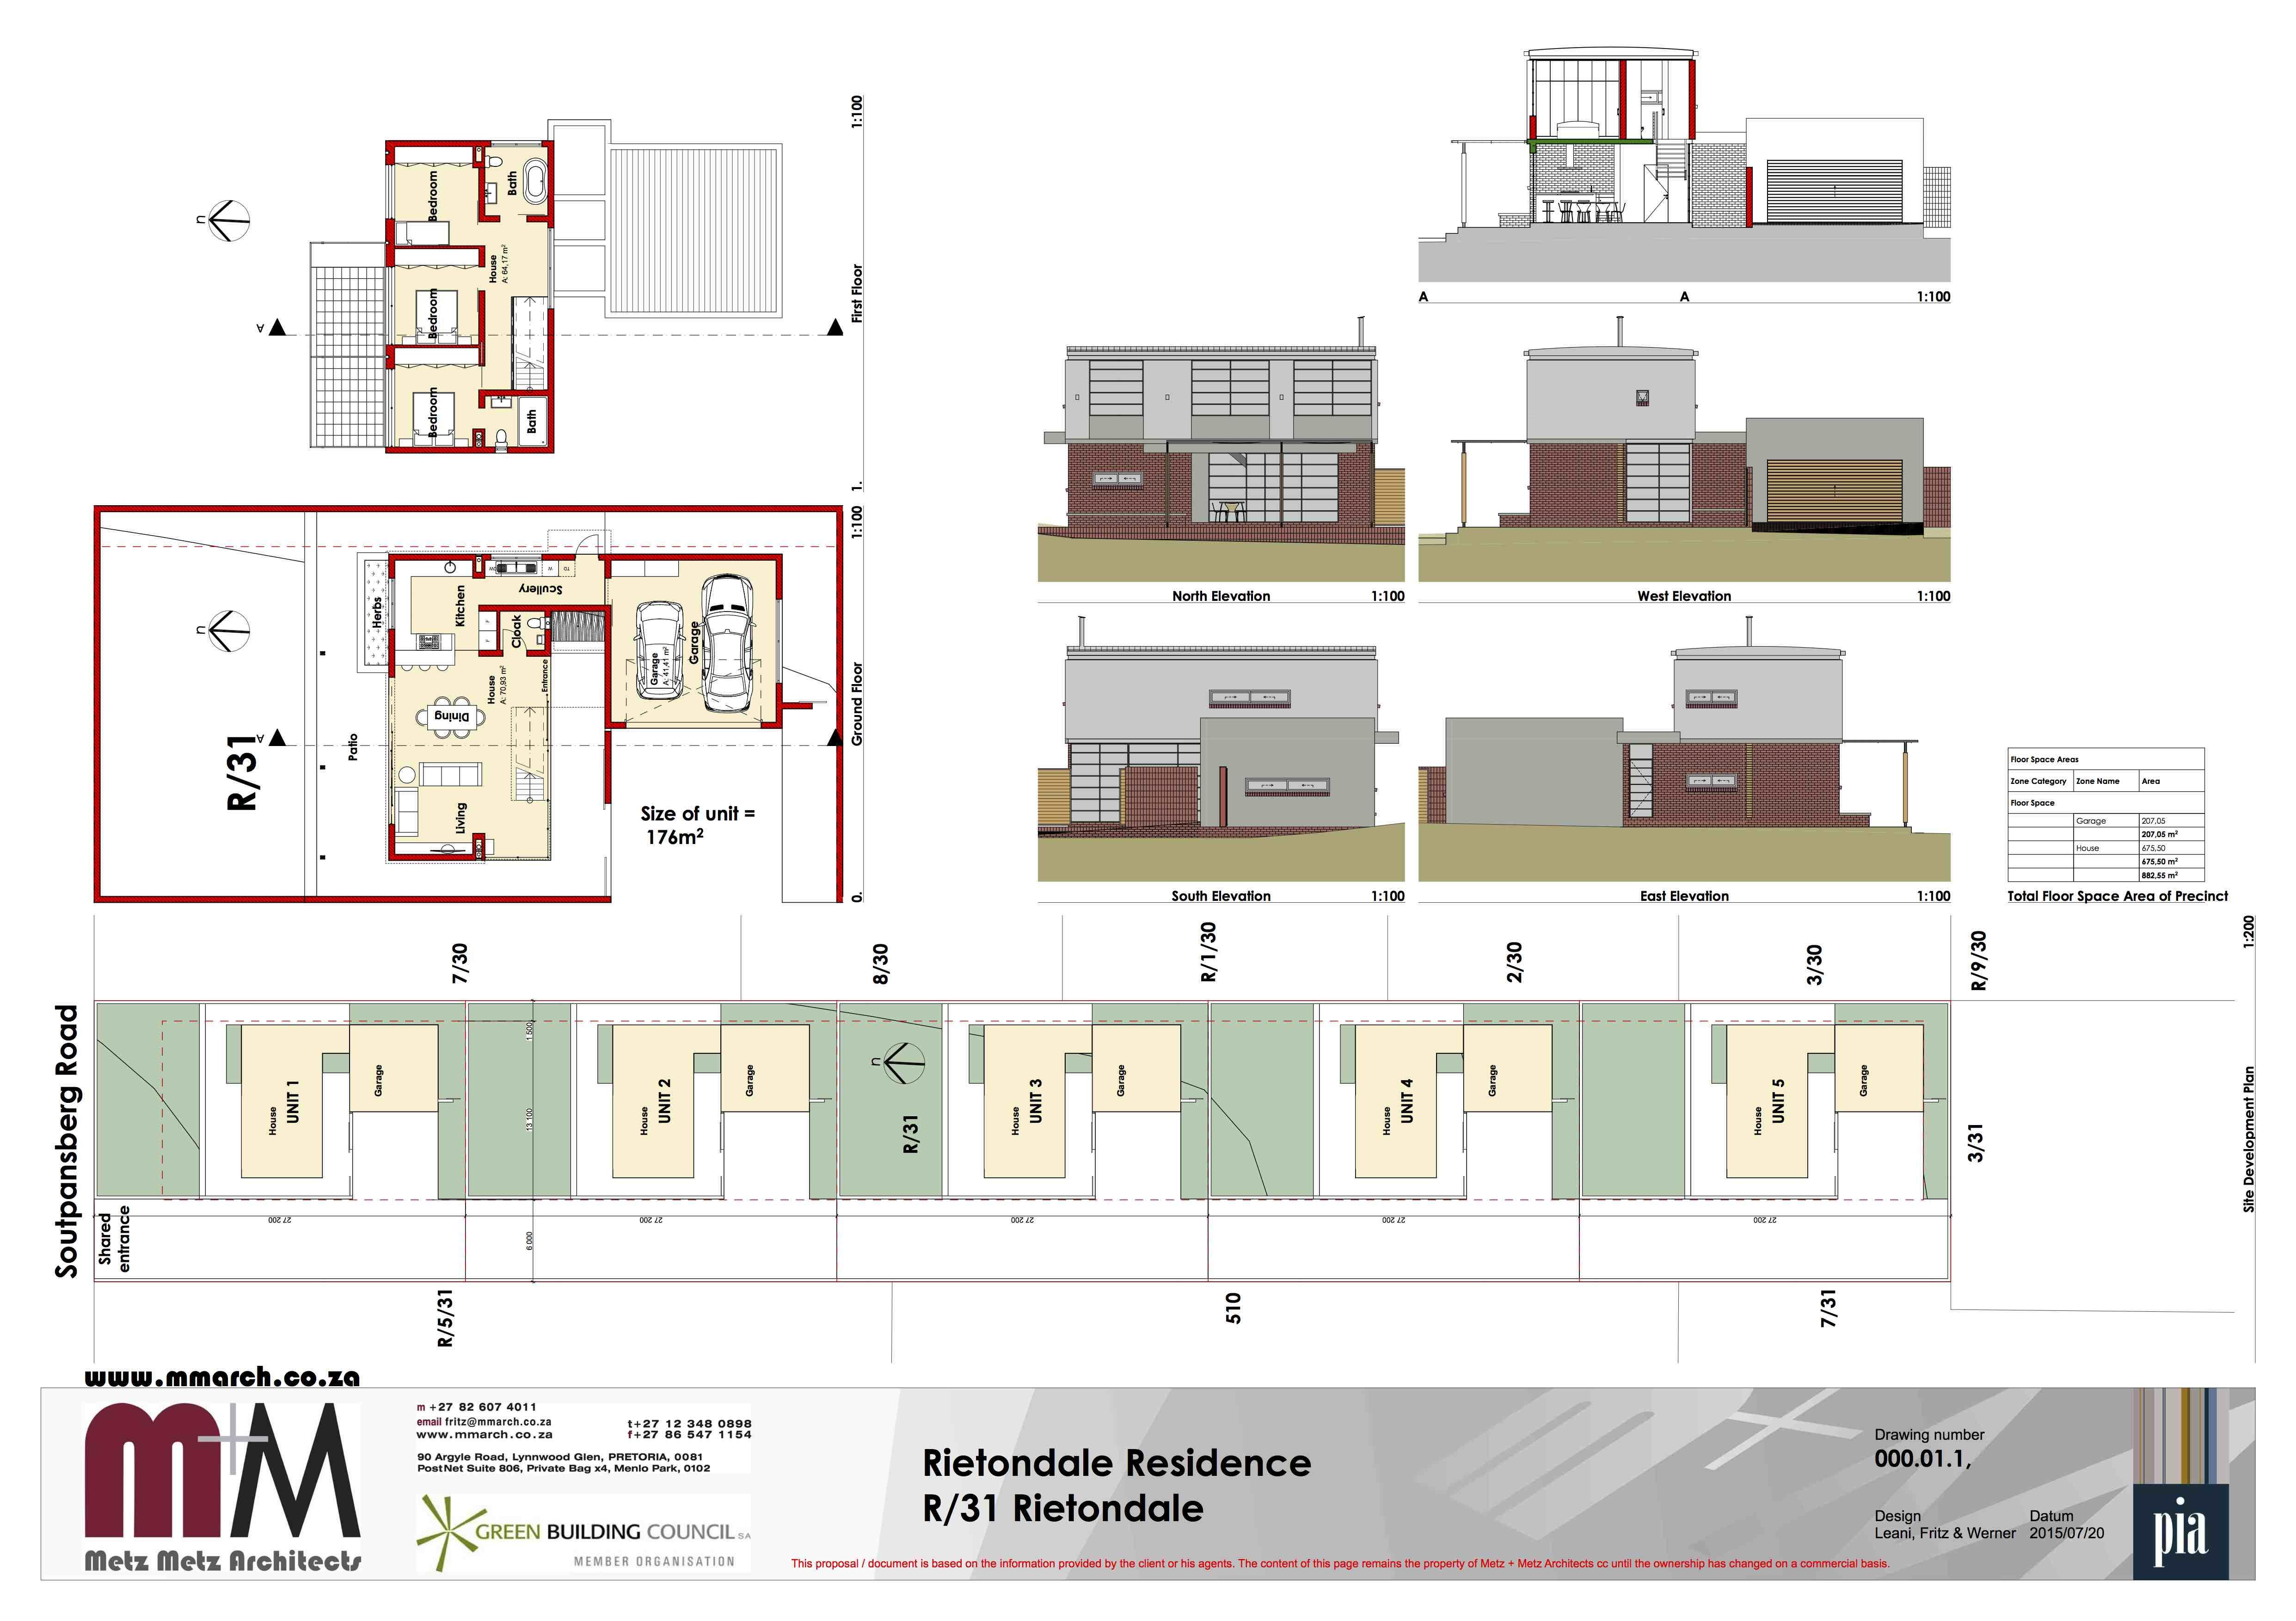 234 Rietondale Residential Precinct - 20 Jul 2015.jpg